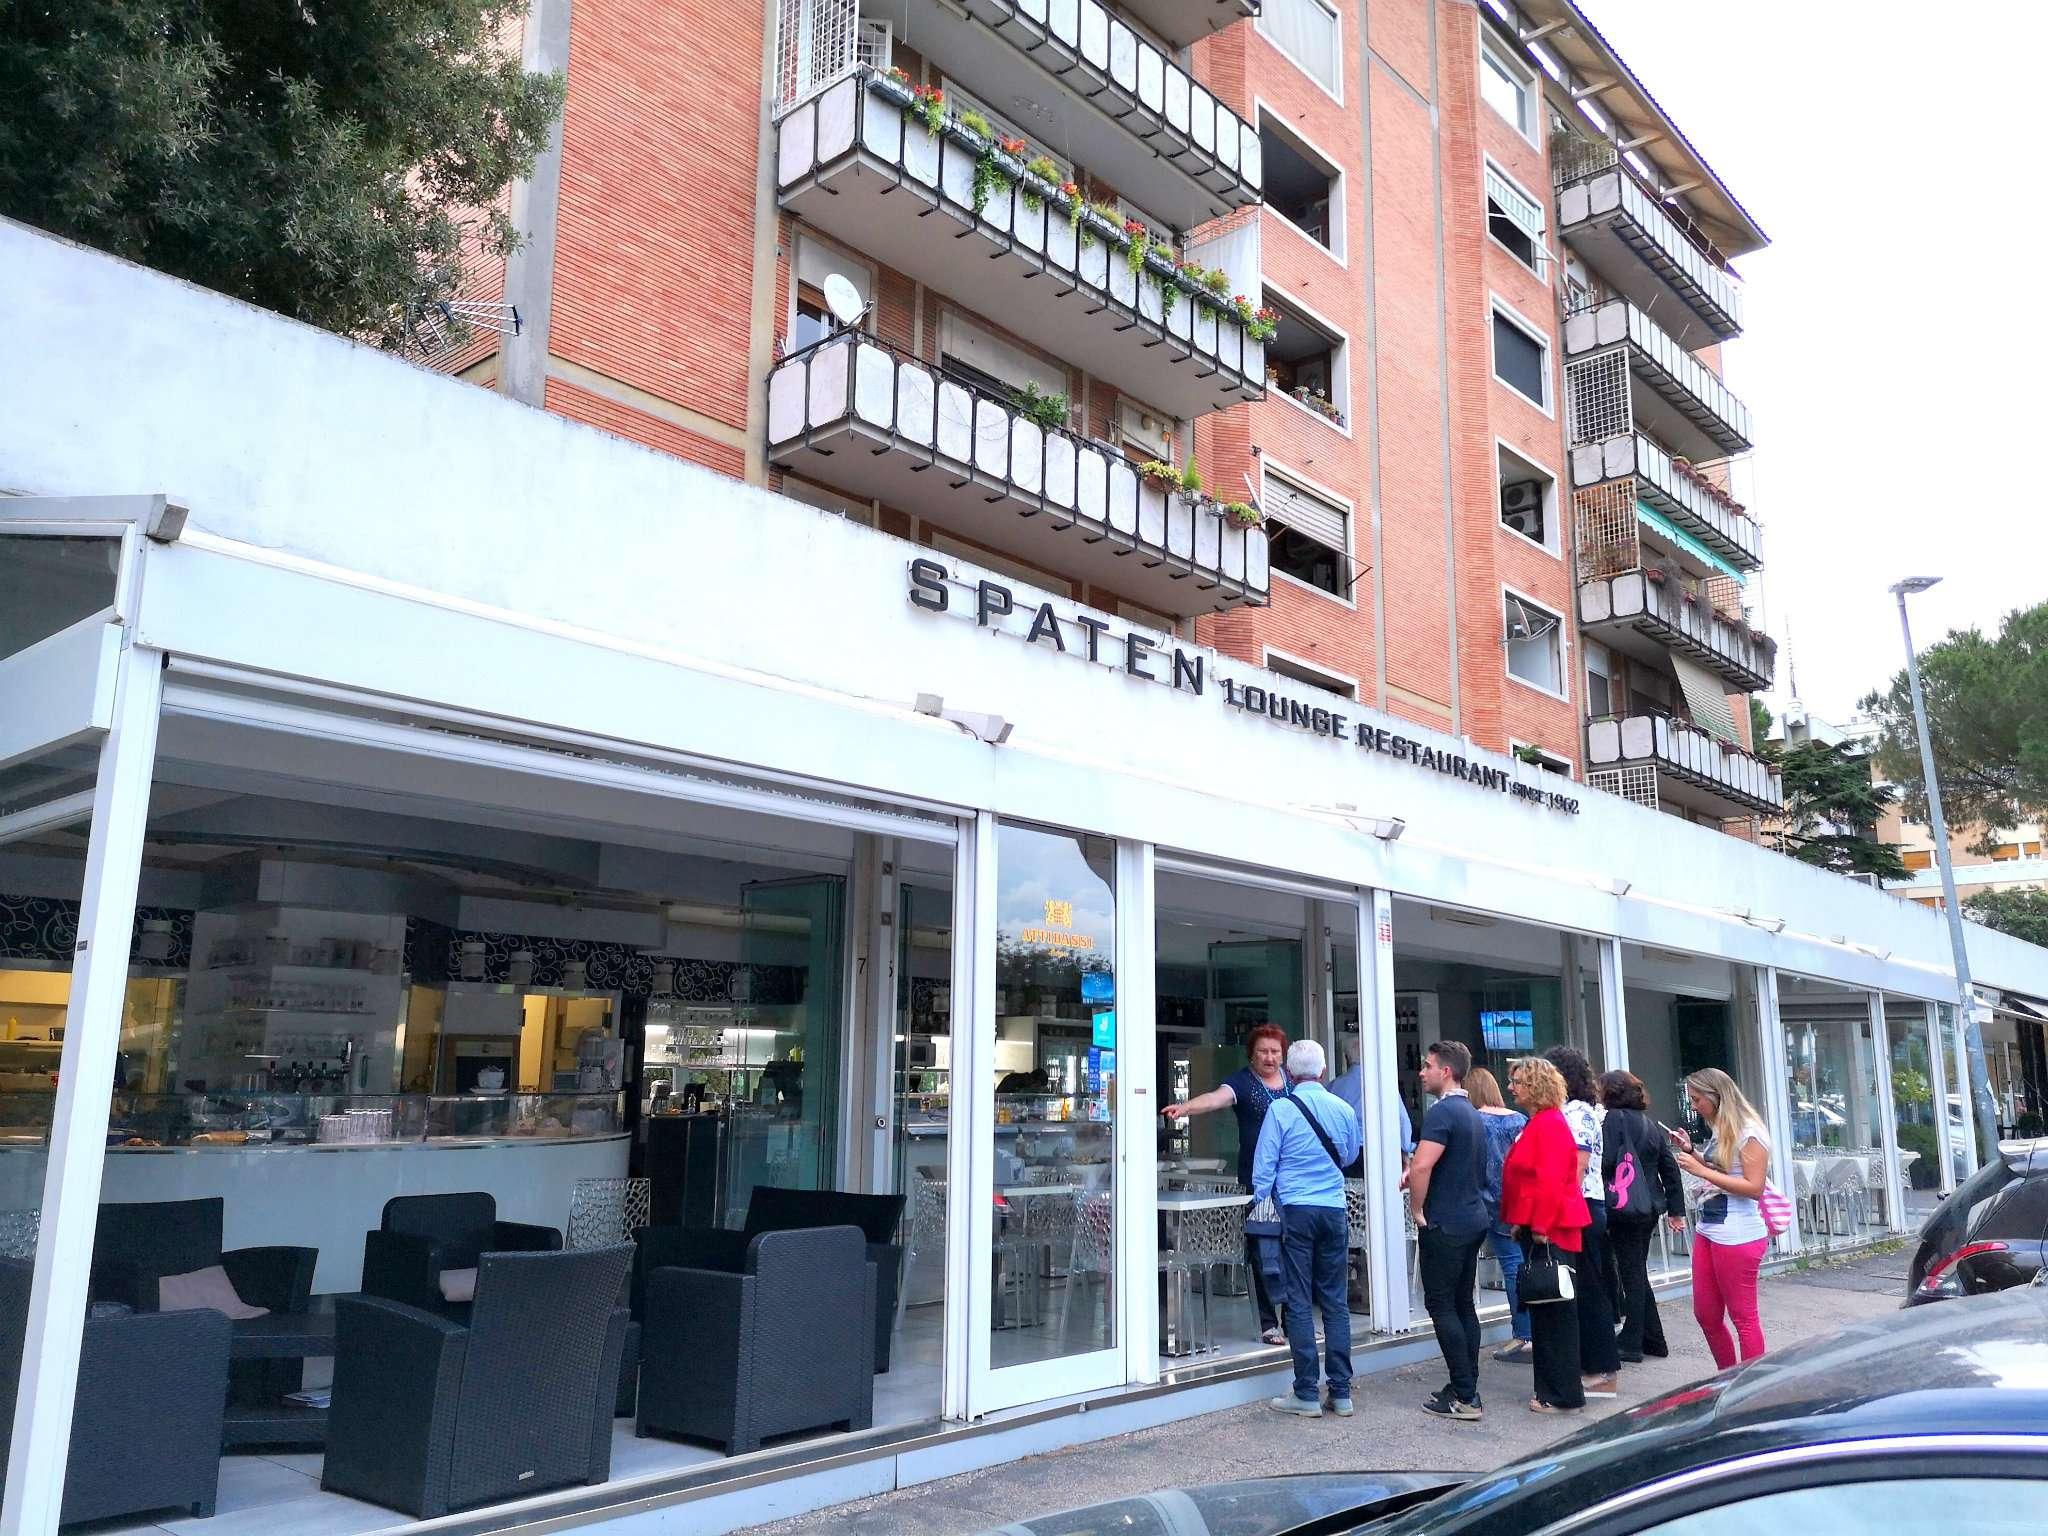 Uffici negozi studi in vendita a roma for Uffici zona eur